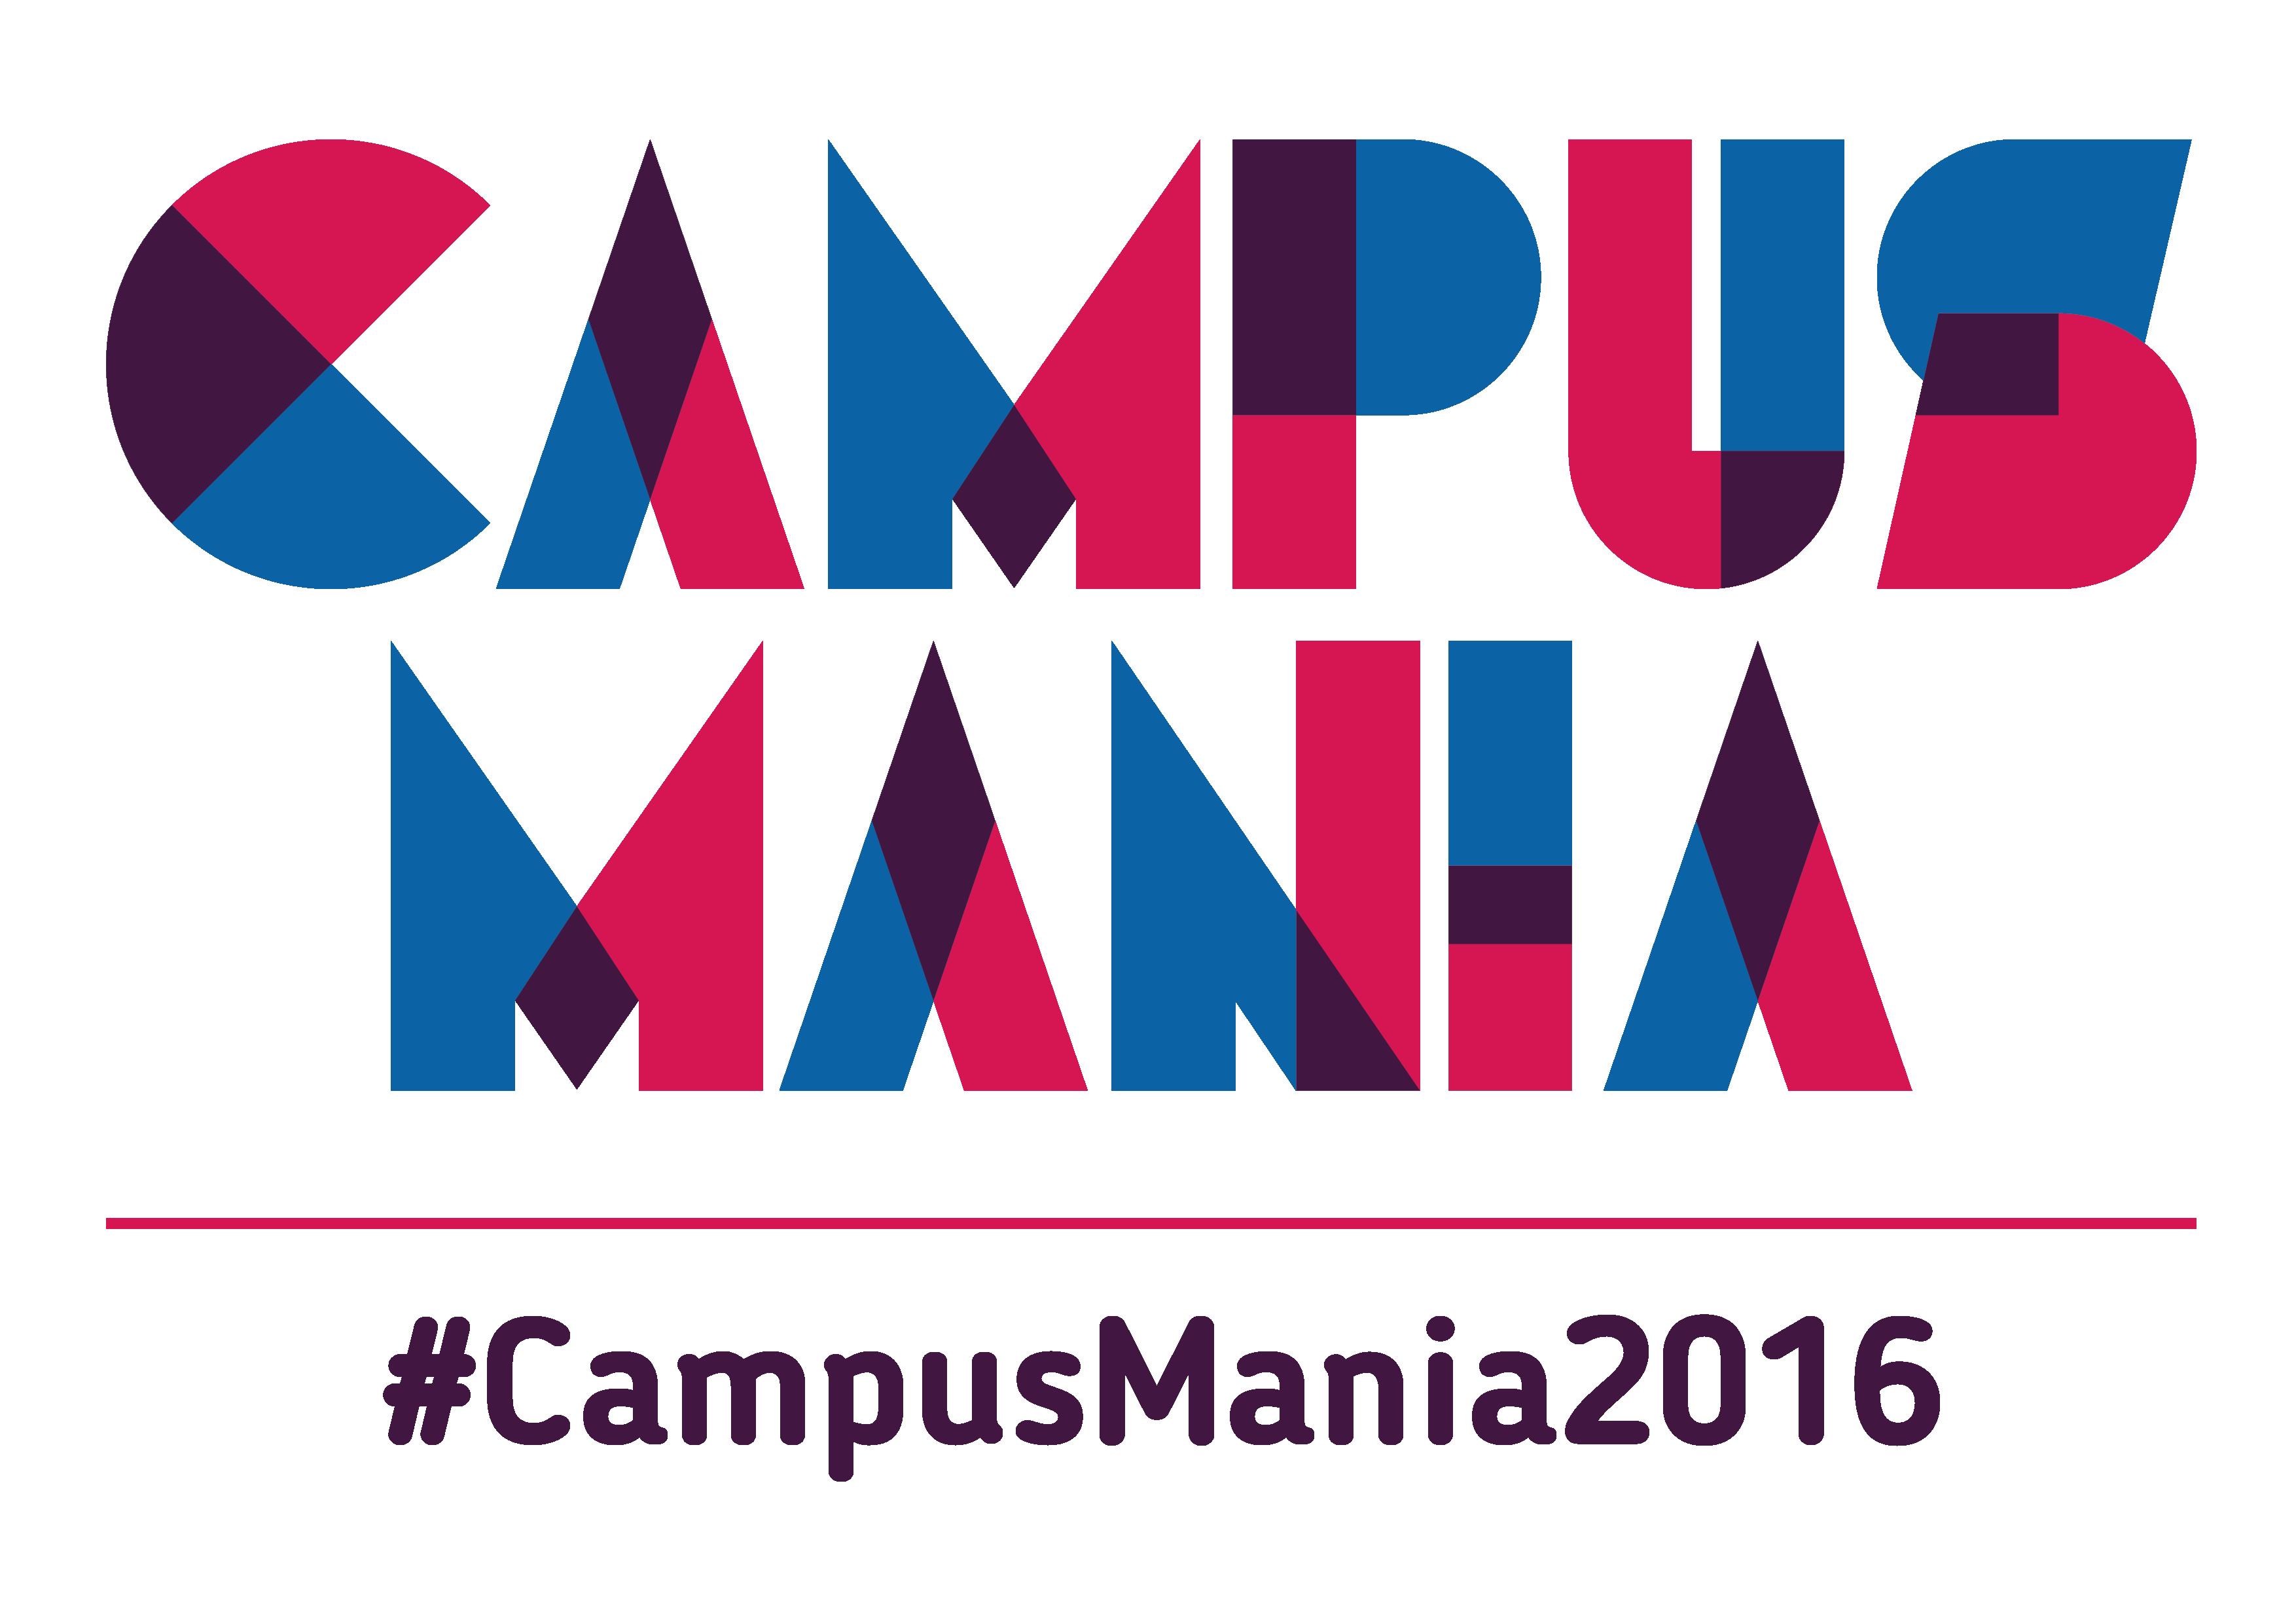 CampusMania